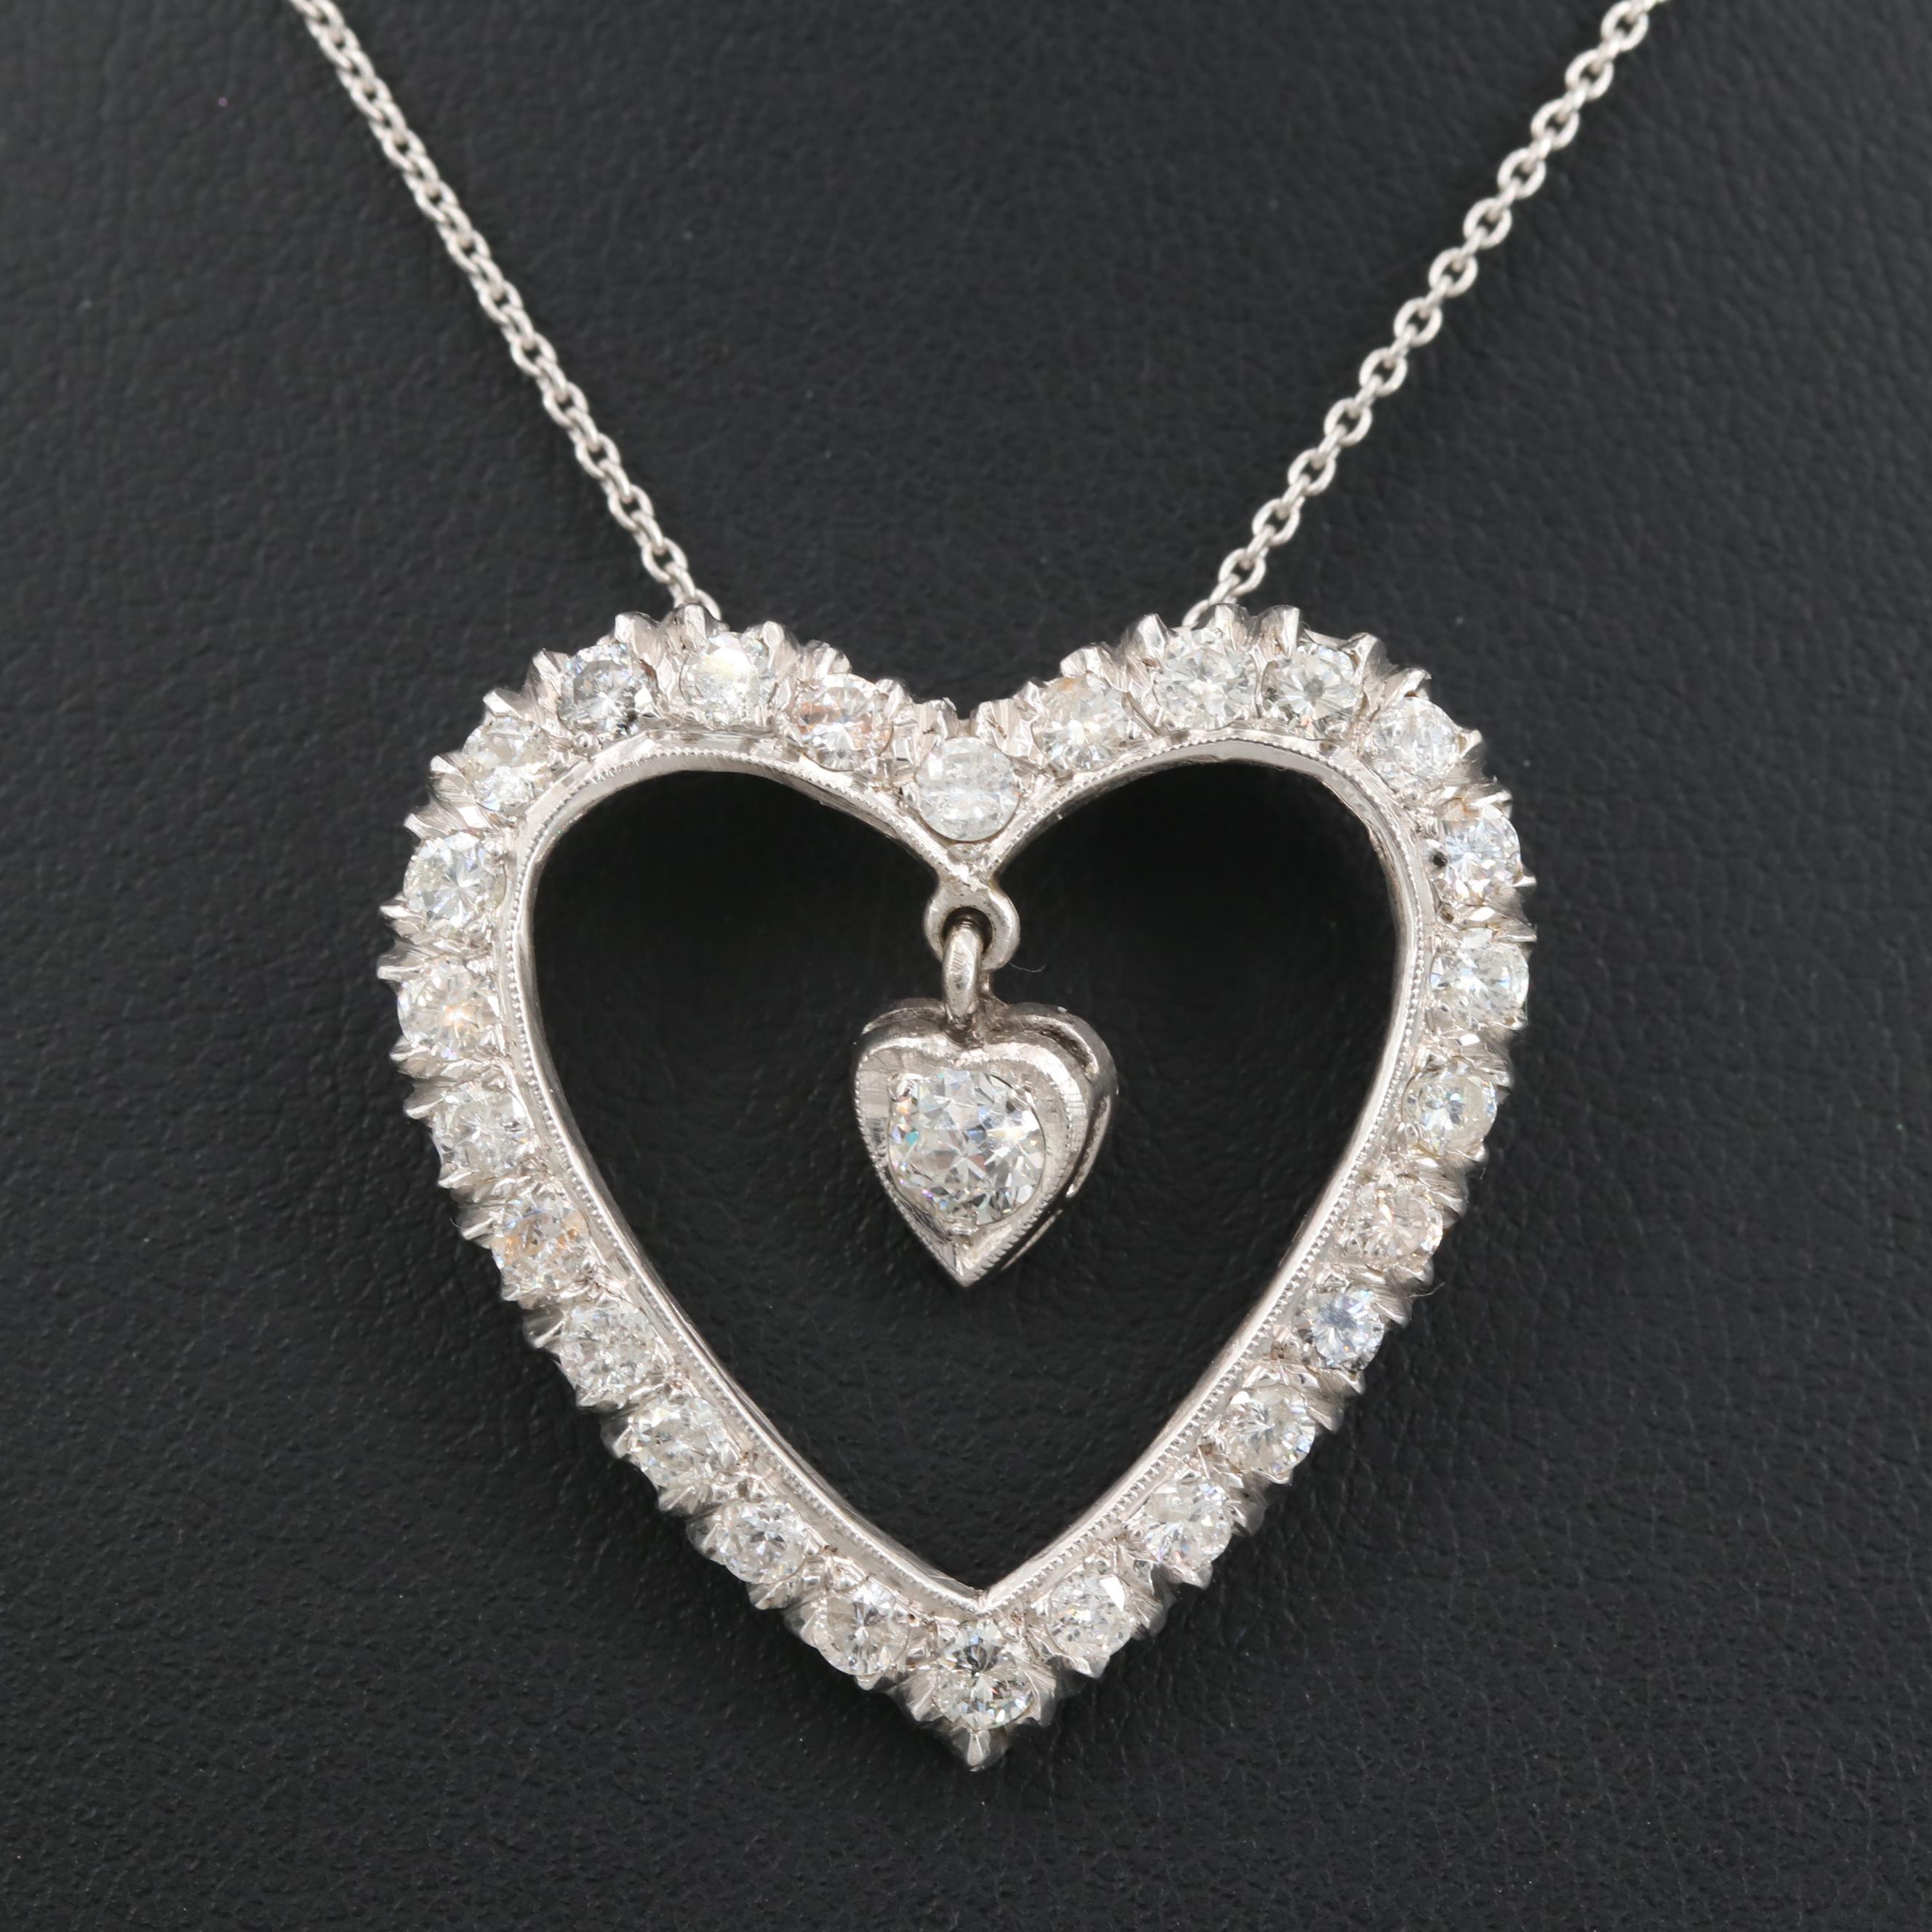 14K White Gold 1.77 CTW Diamond Heart Pendant Necklace